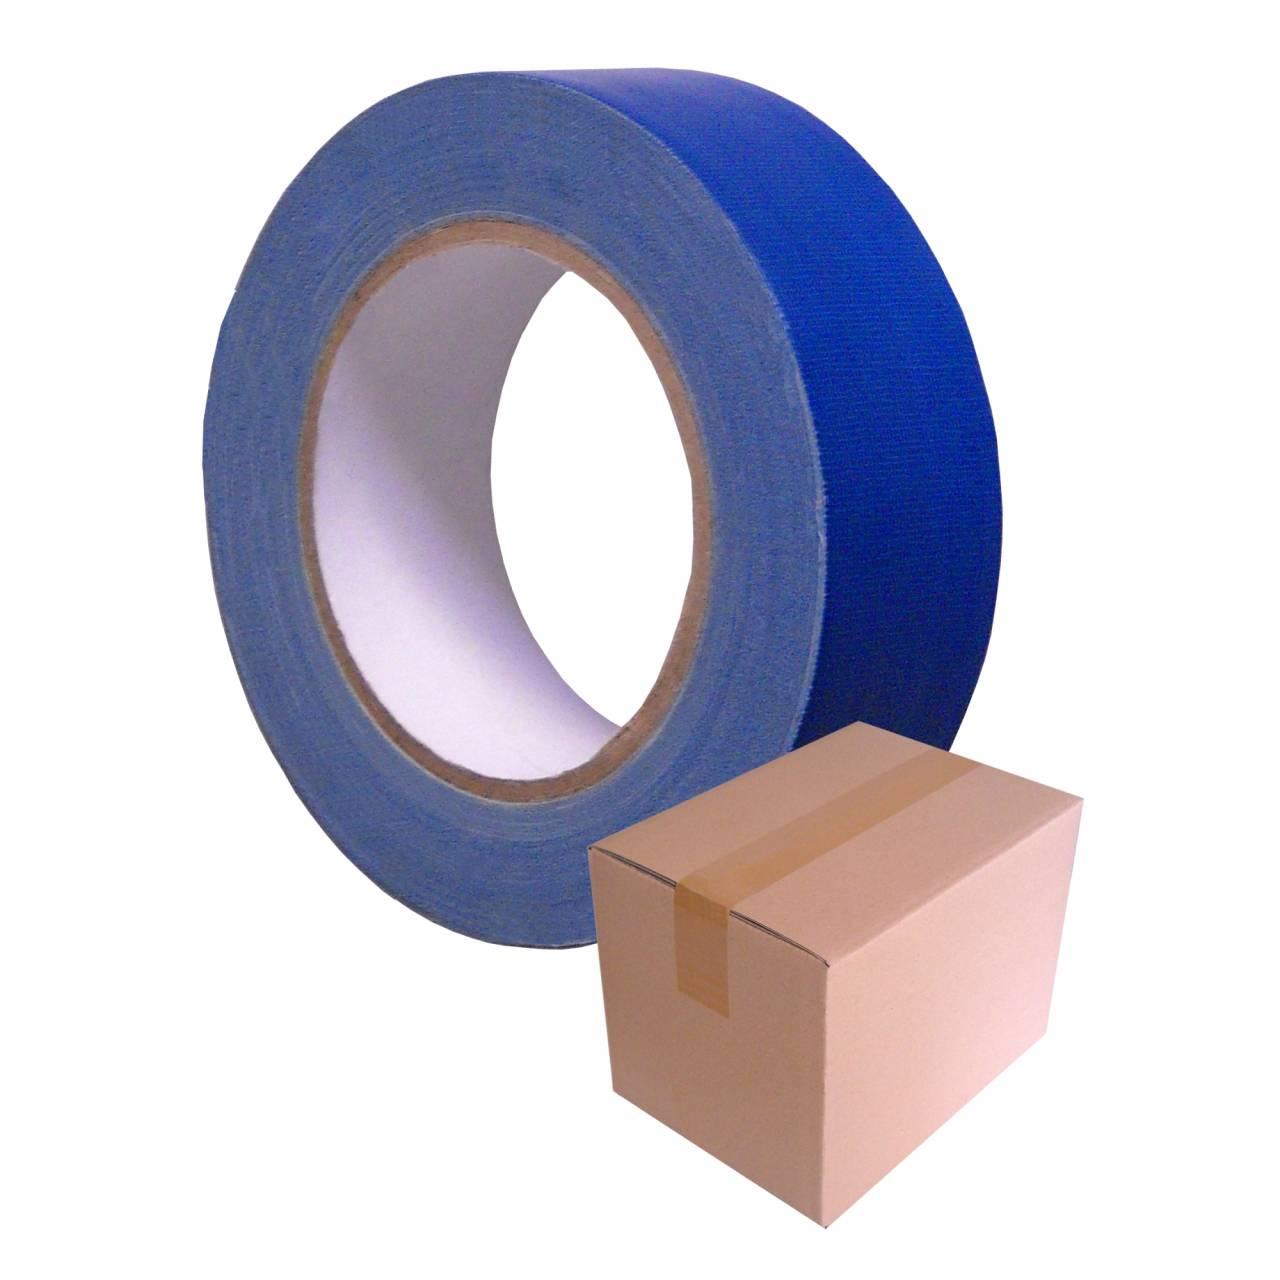 Gewebe-Klebeband T104 UV-blau, 19 mm x 25 m / Krt a 64 Rollen